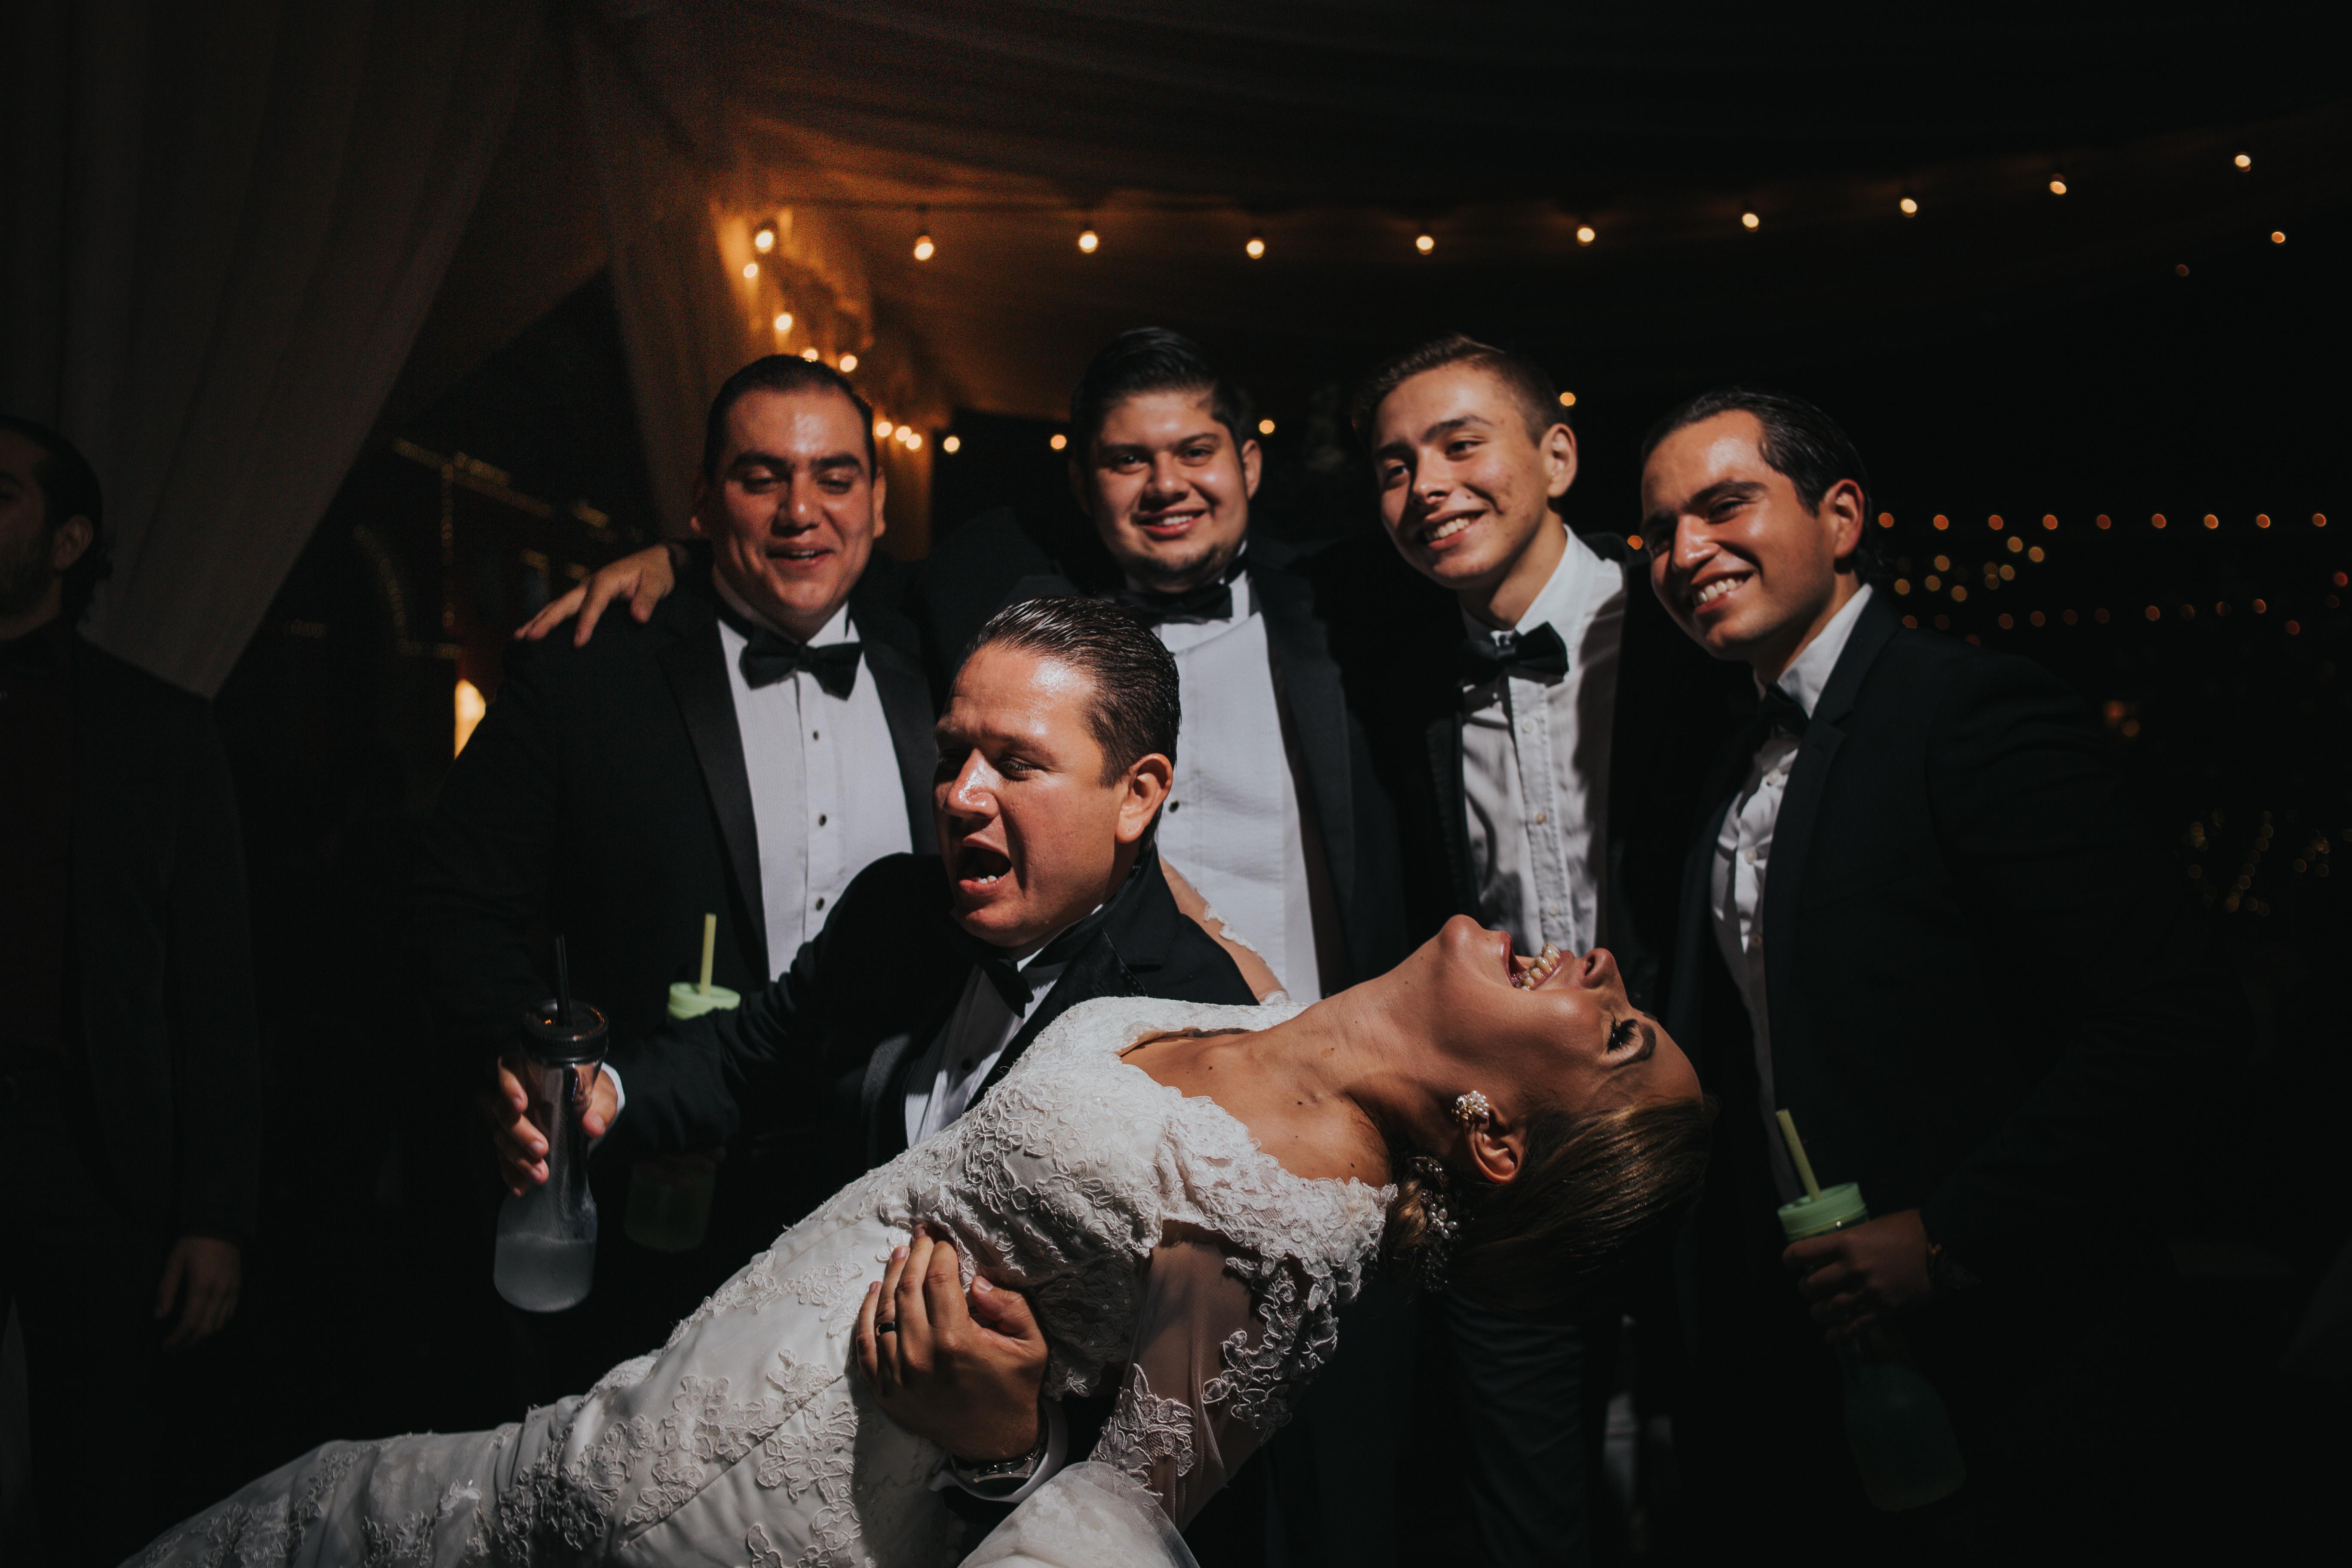 Fotografo de bodas Guadalajara